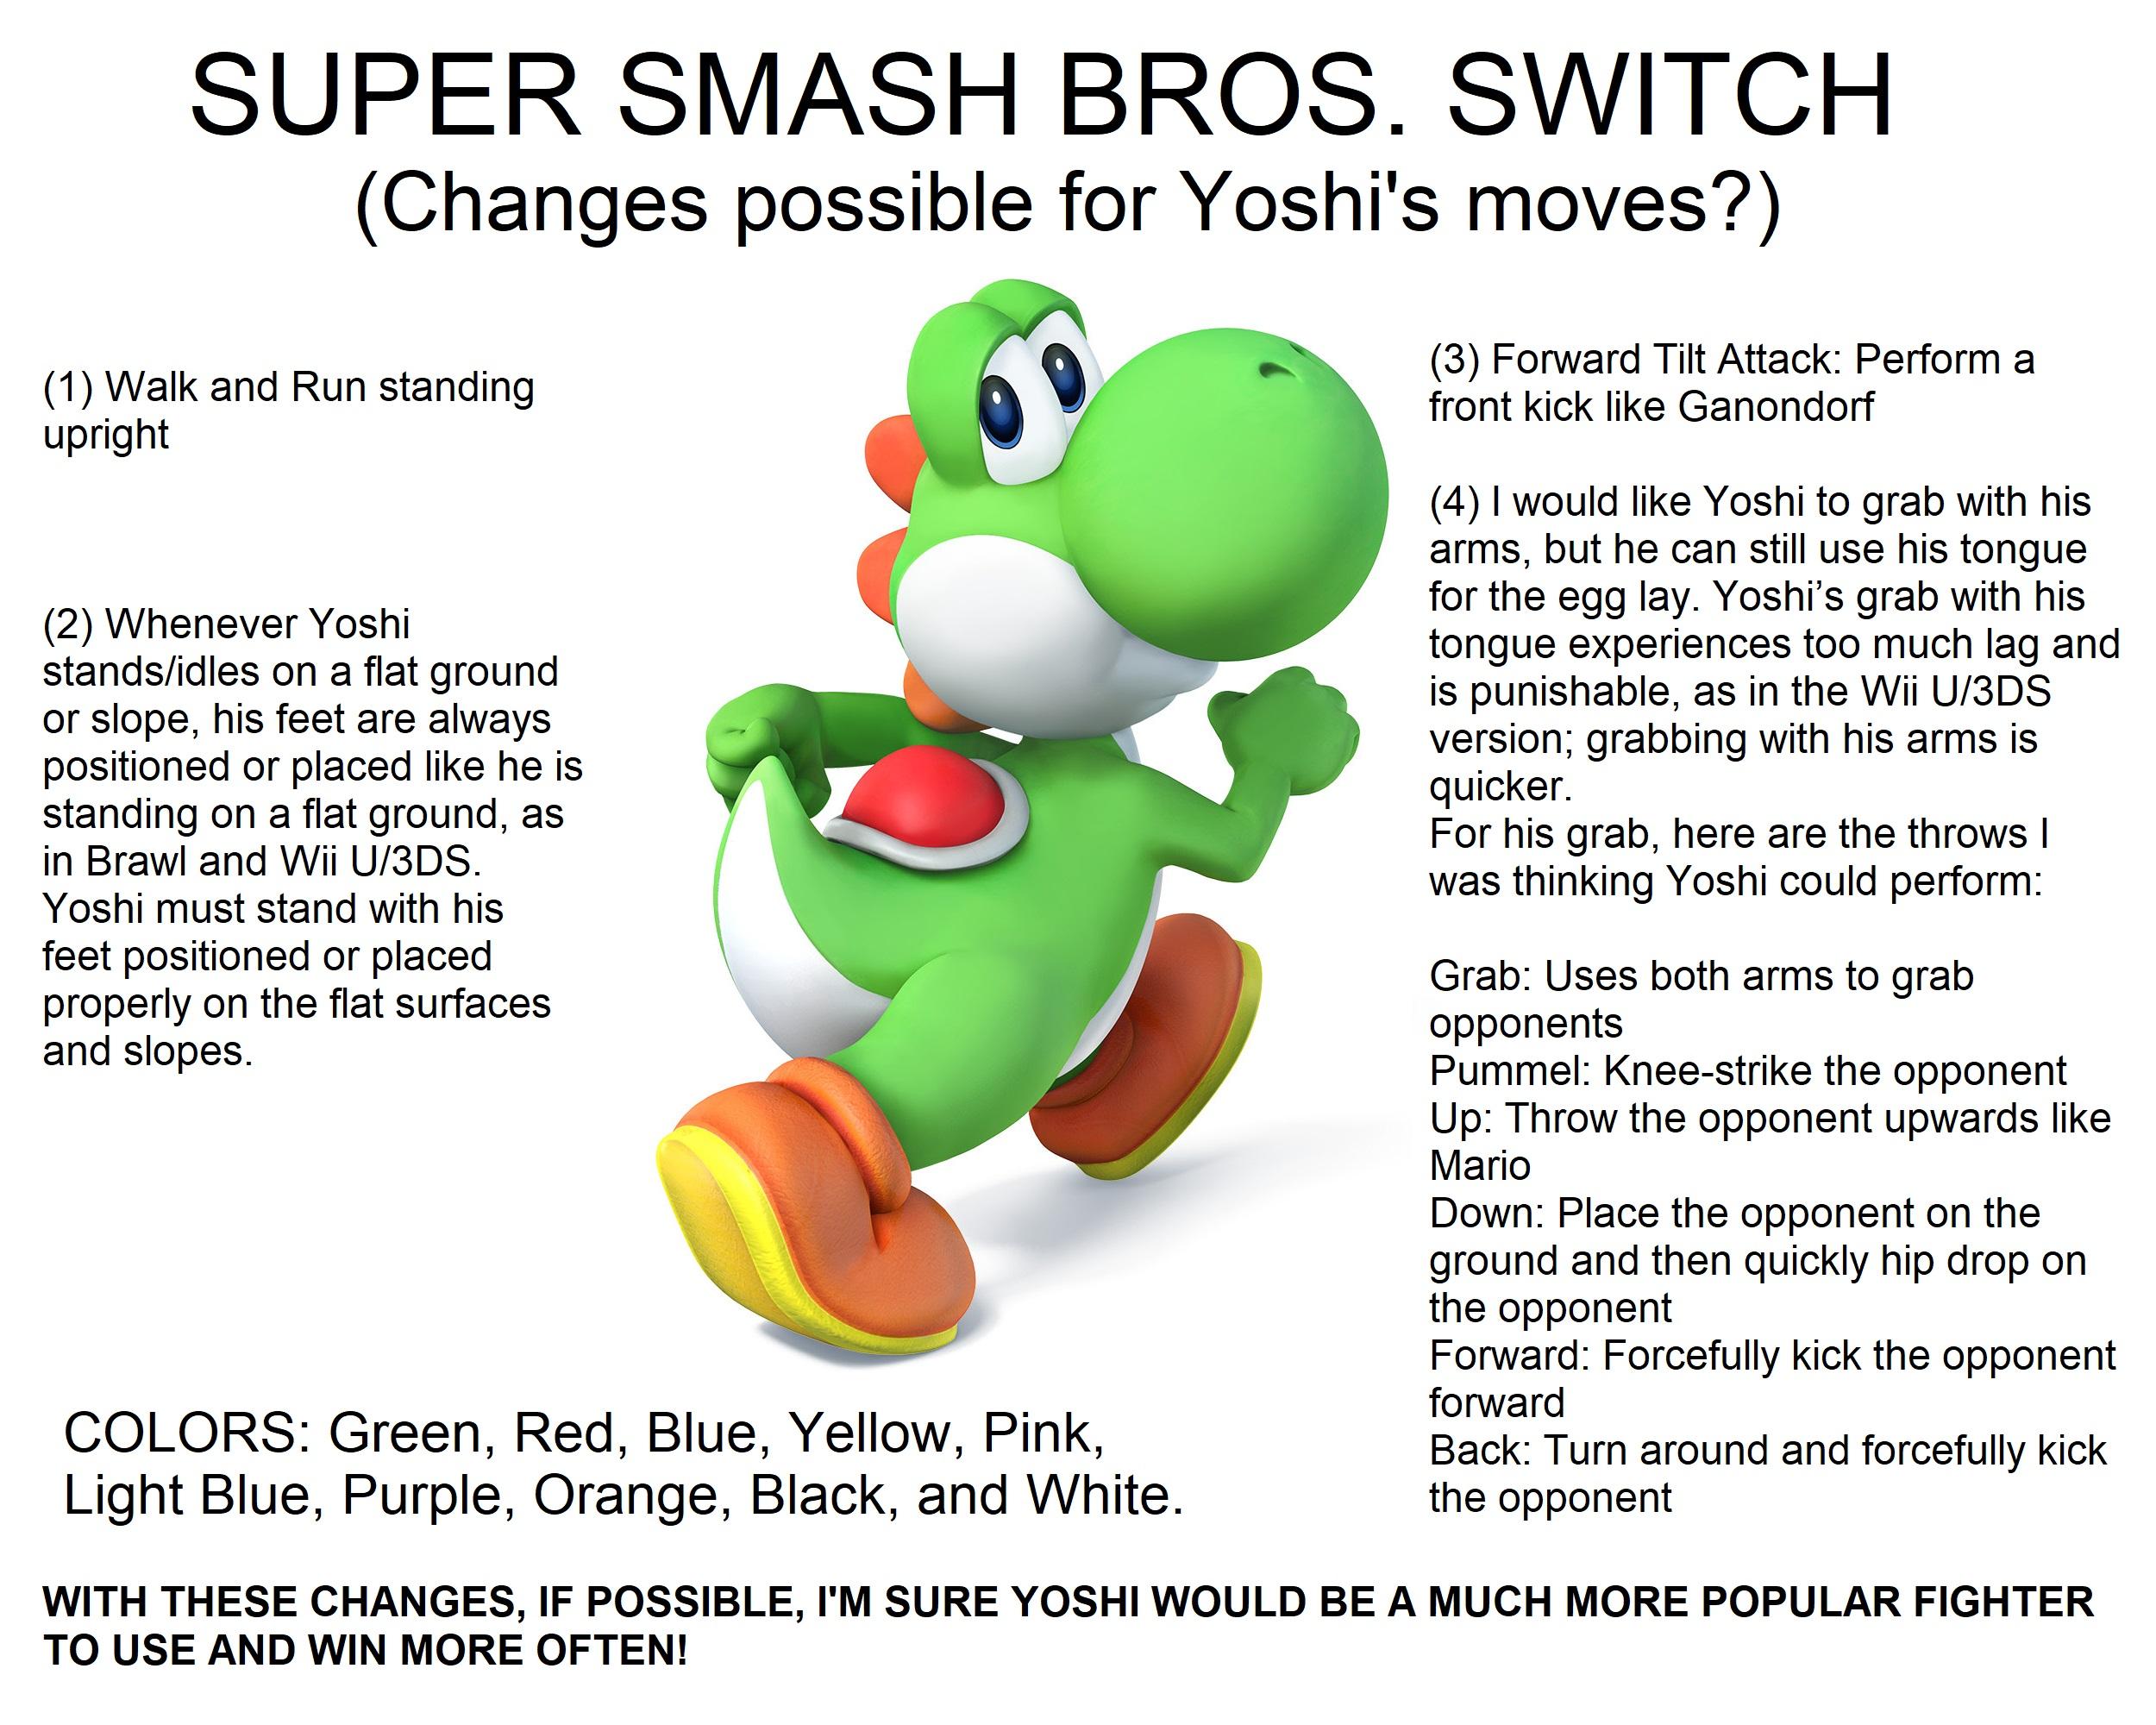 yoshi super smash bros 5 images yoshi super smash bros switch